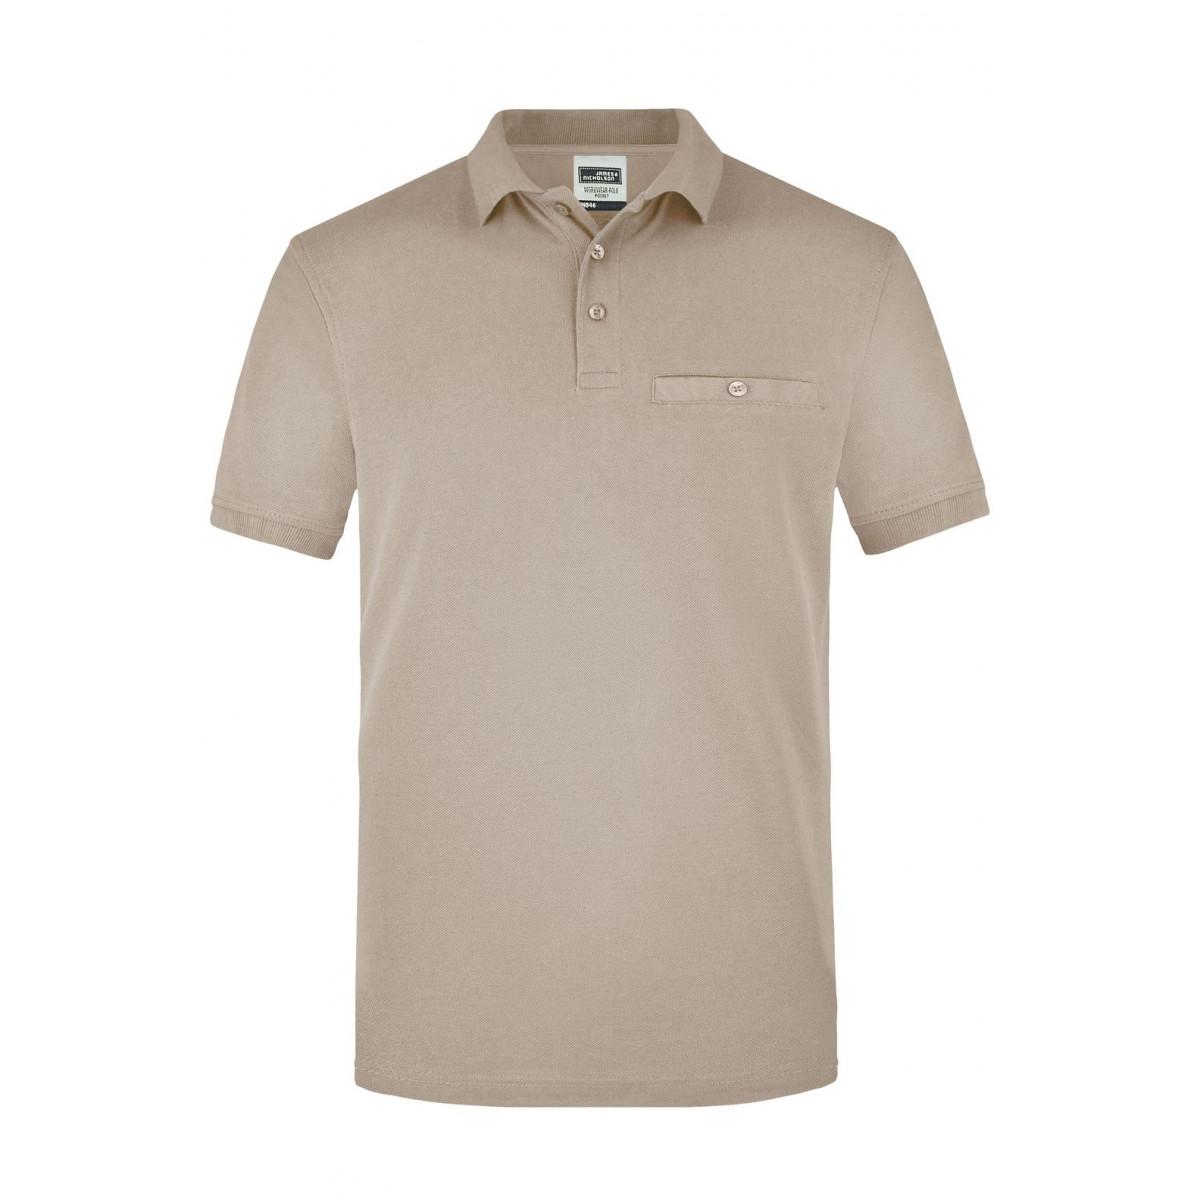 Рубашка поло мужская JN846 Men´s Workwear Polo Pocket - Бежевый